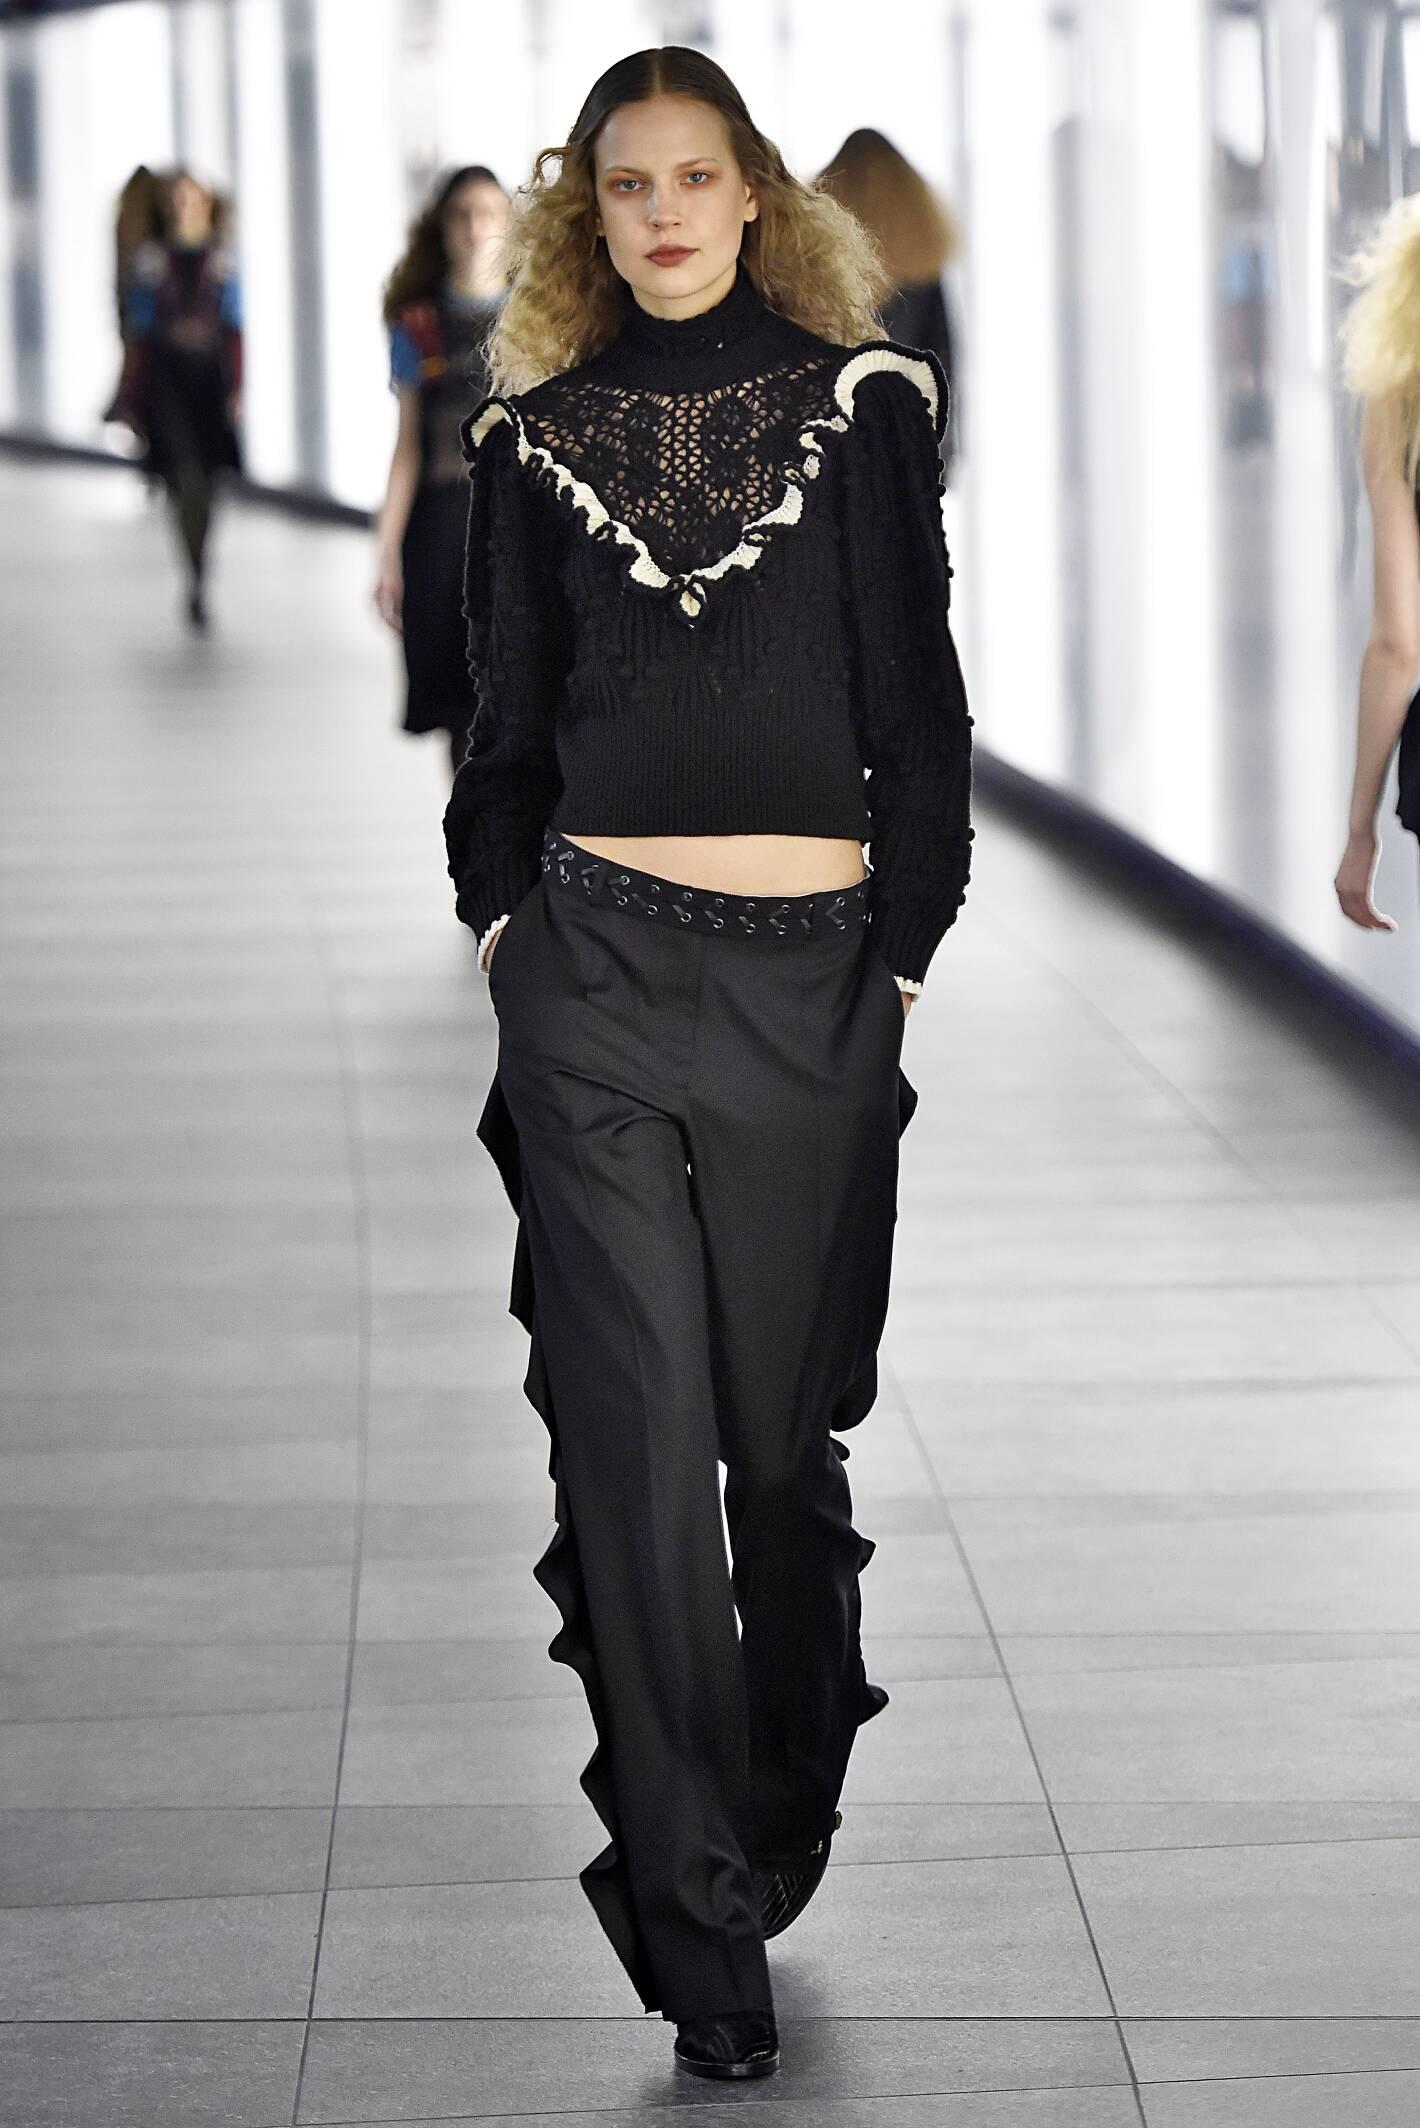 Fashion Model Preen by Thornton Bregazzi Collection Catwalk